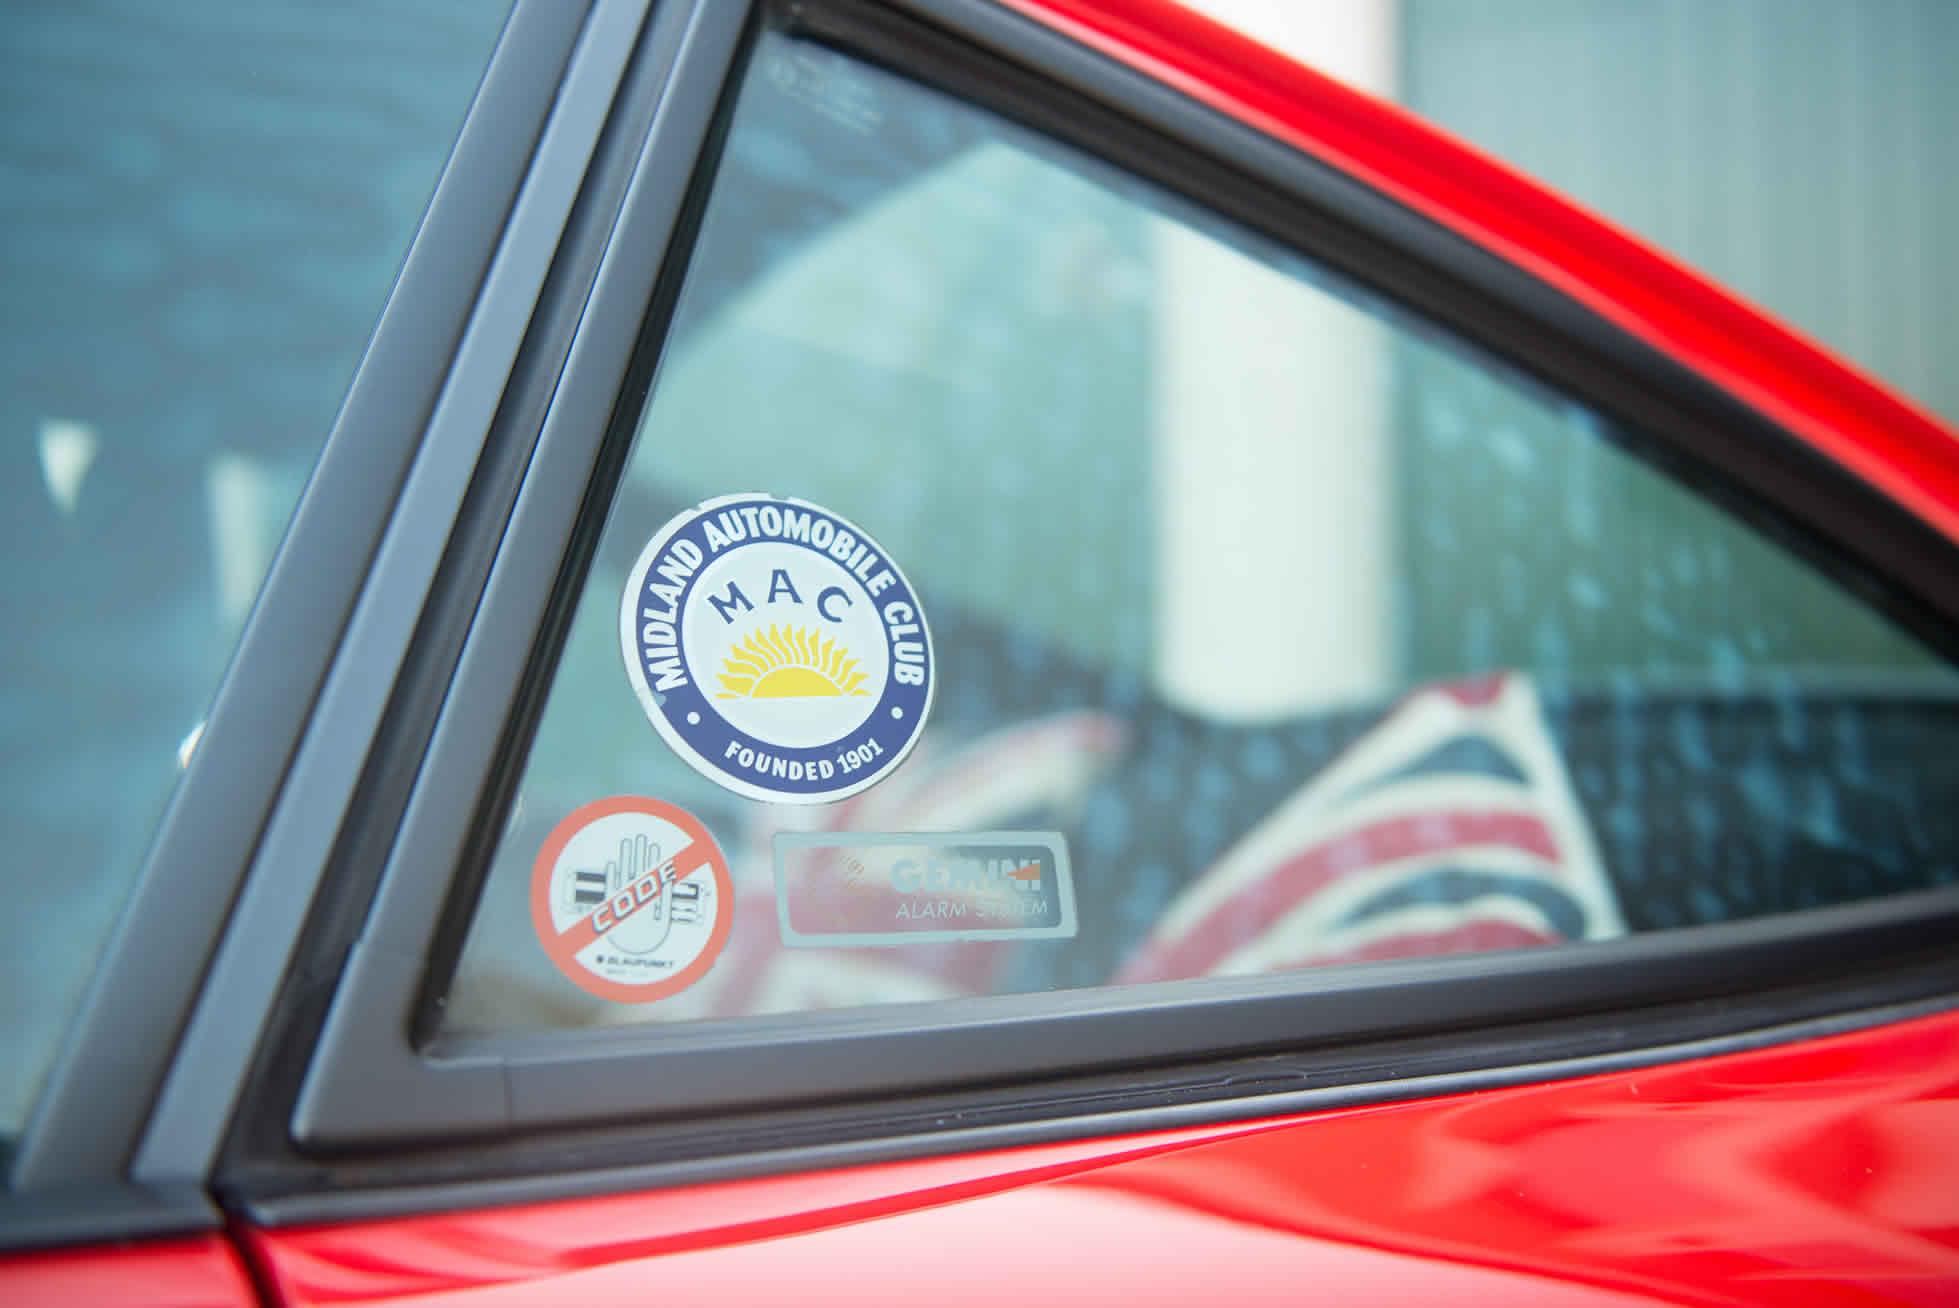 For Sale 1989 Porsche 3.2 Carrera Club Sport window